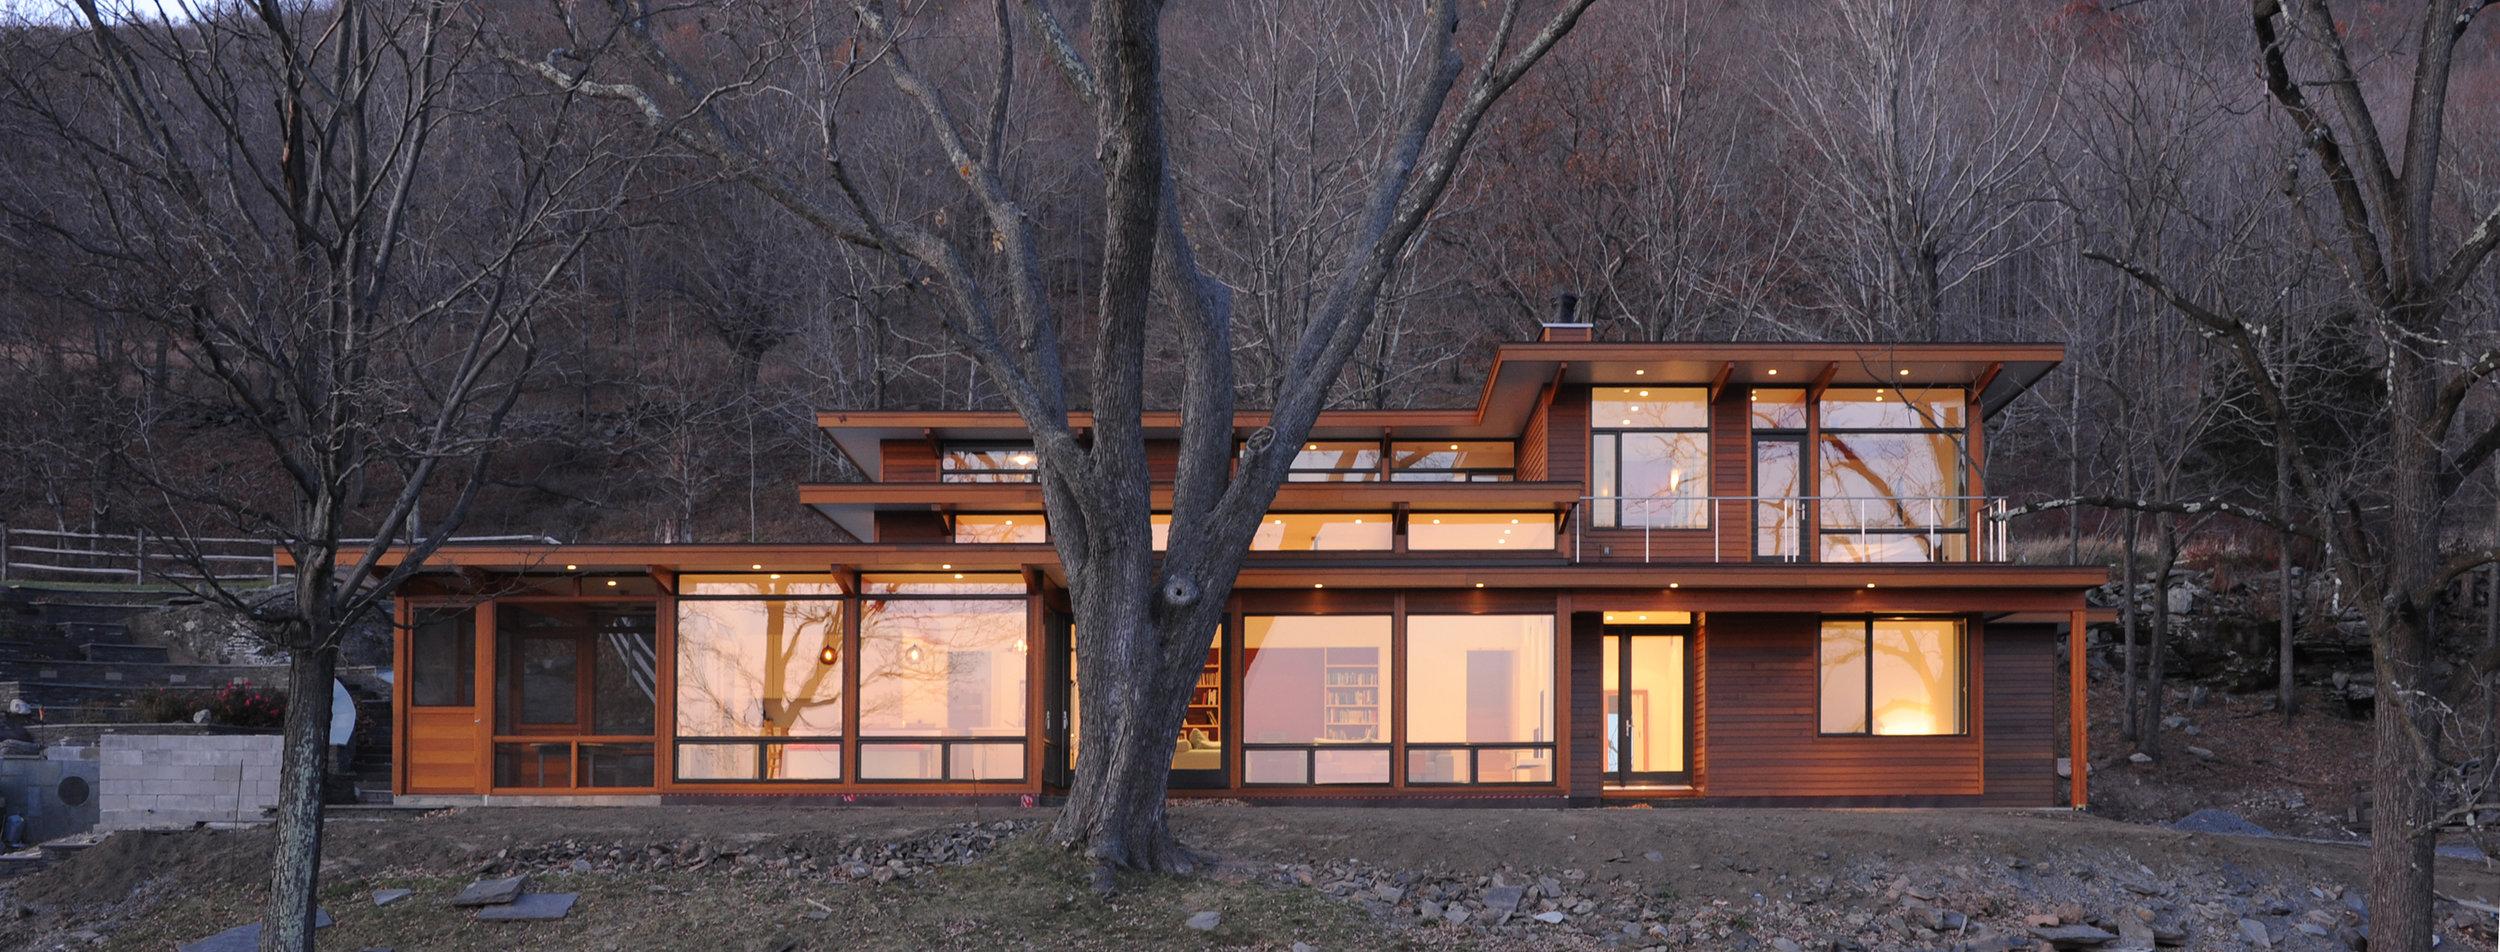 turkel_modern_design_prefab_home_reservoir_shokan_NY_exterior_afternoon.jpg